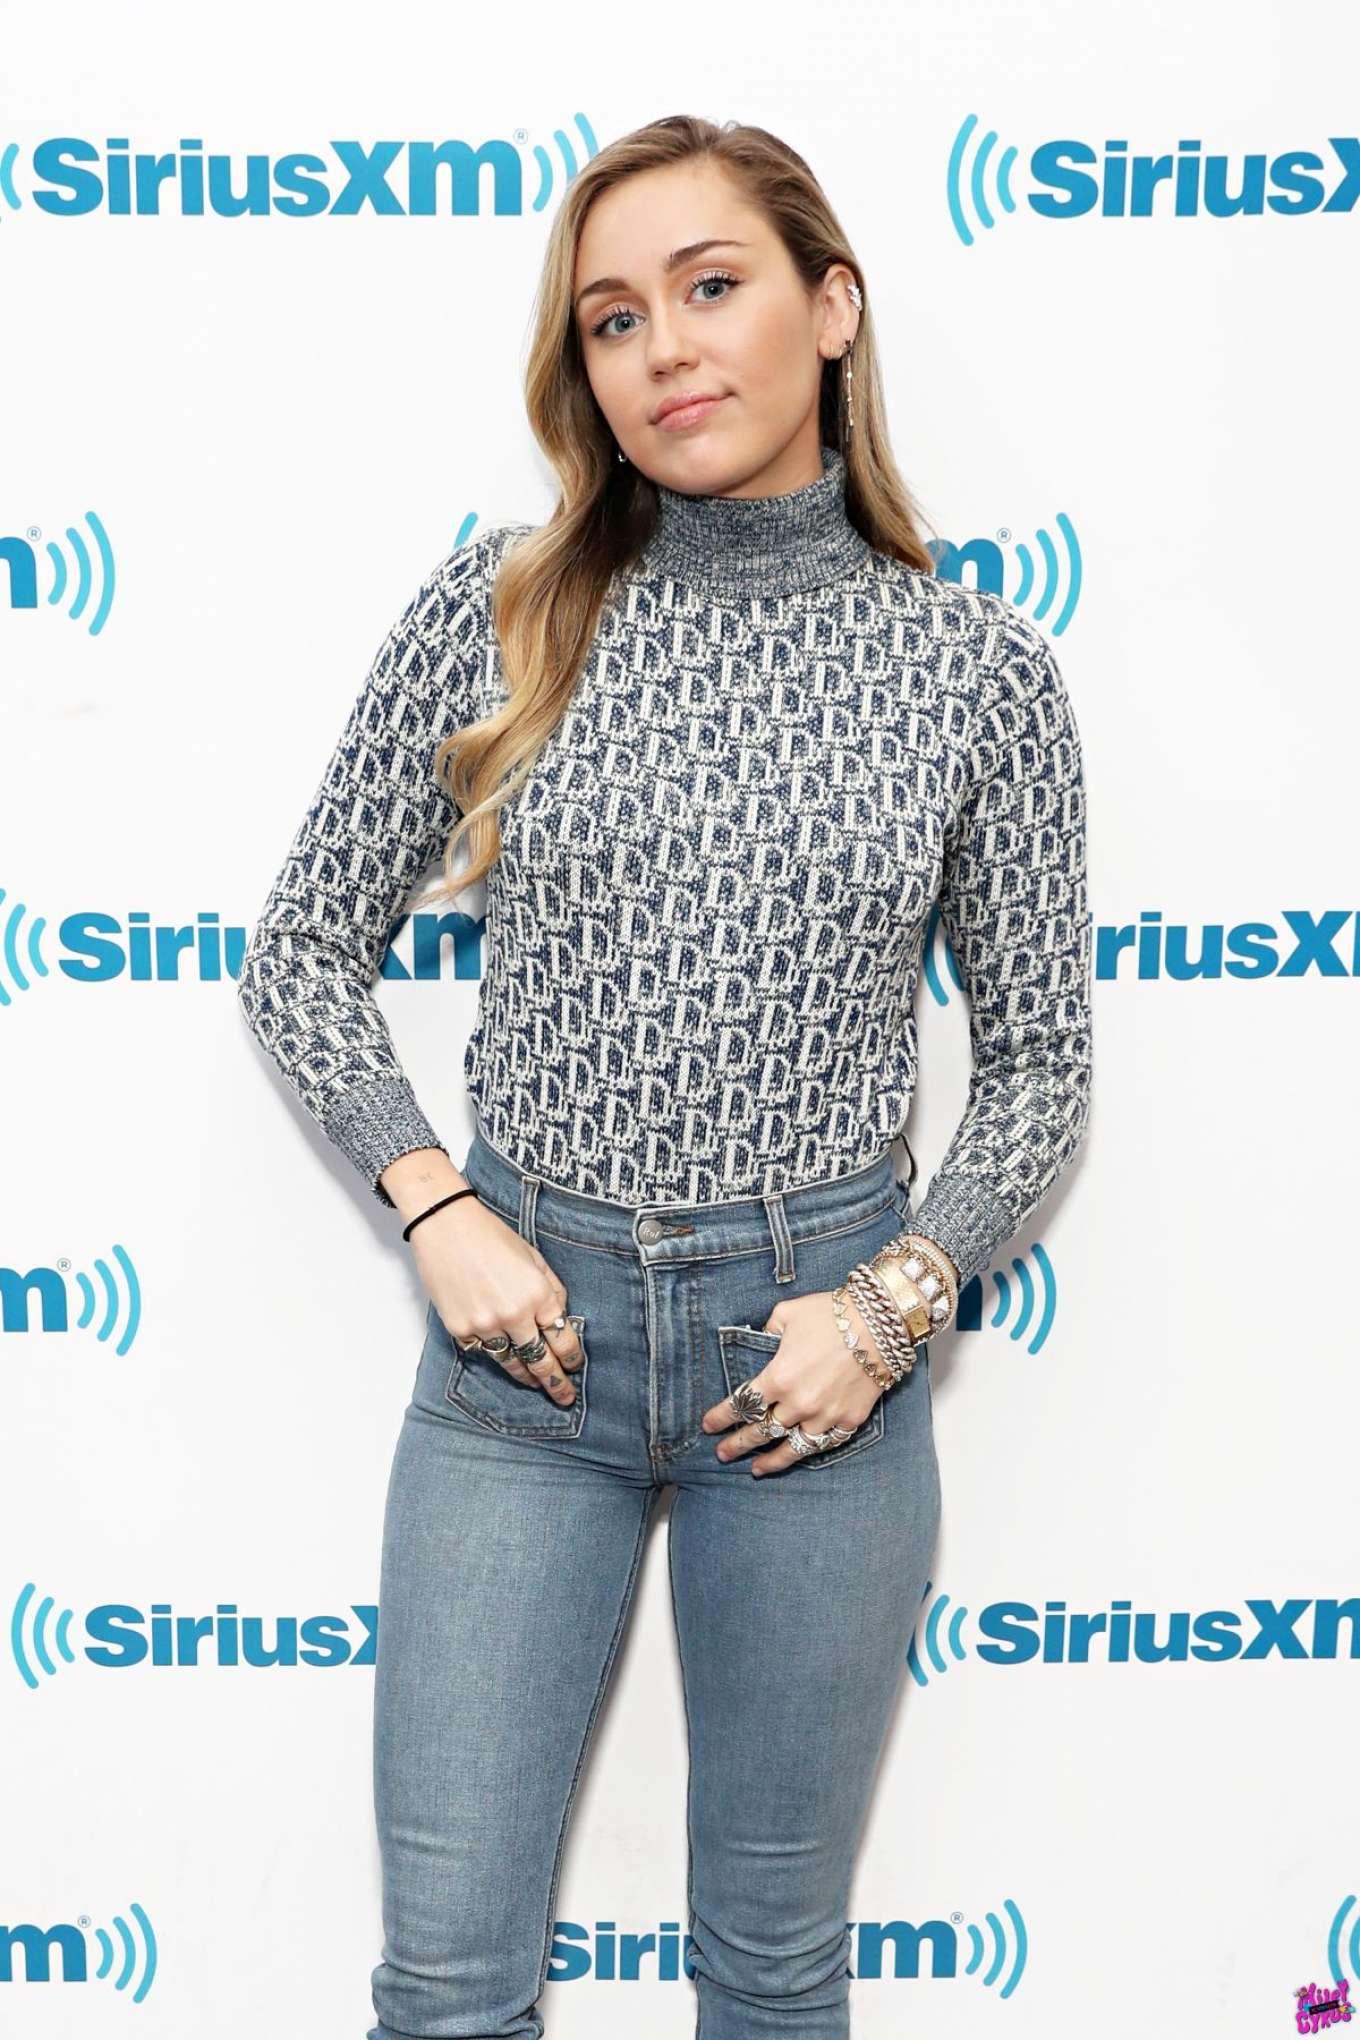 Miley Cyrus - Visits the SiriusXM Studios in New York City